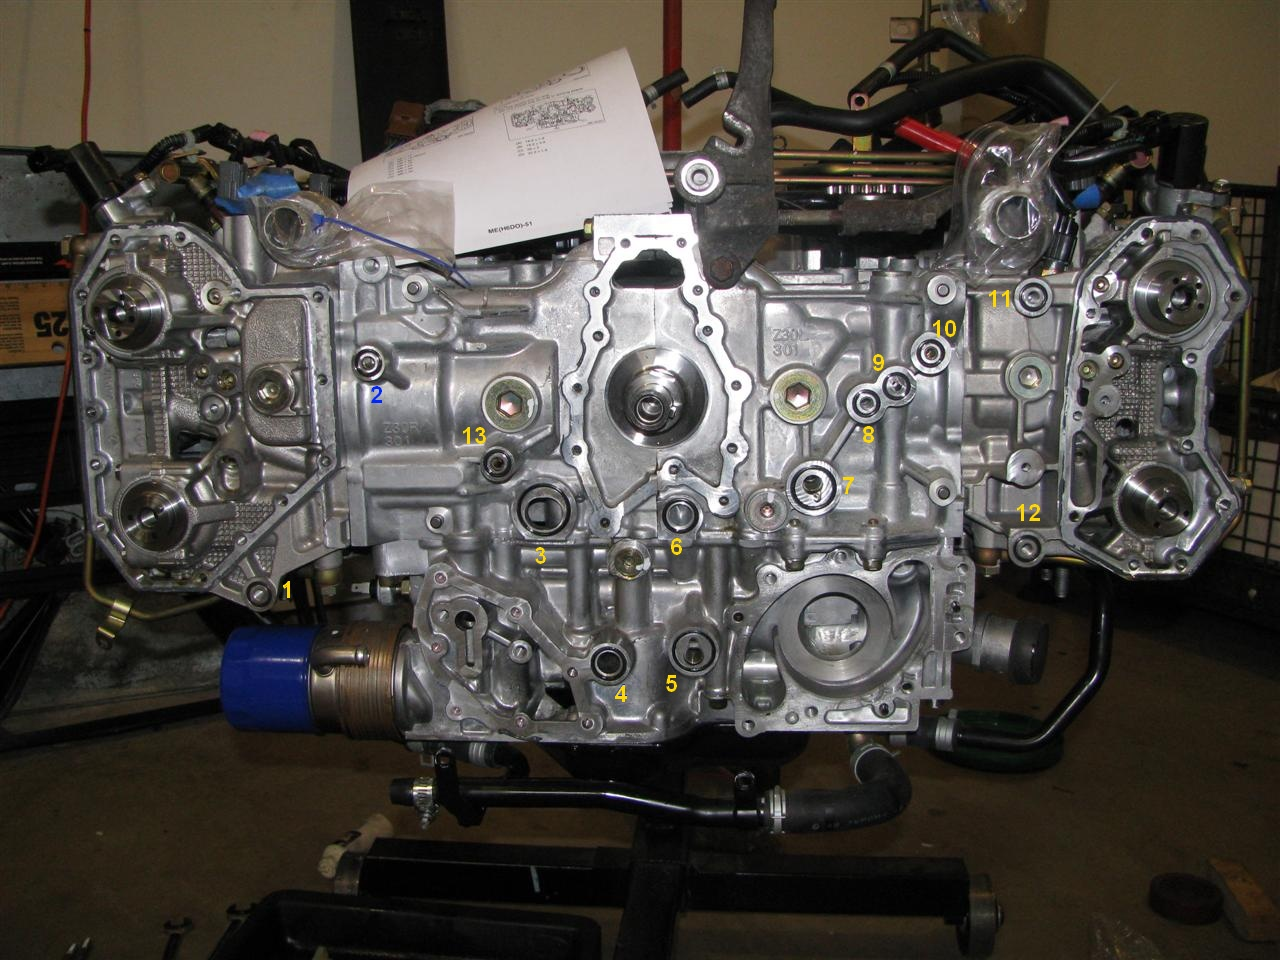 1972 porsche 914 wiring diagram well pump switch install www toyskids co ez30 engine cosworth boxer horn 1973